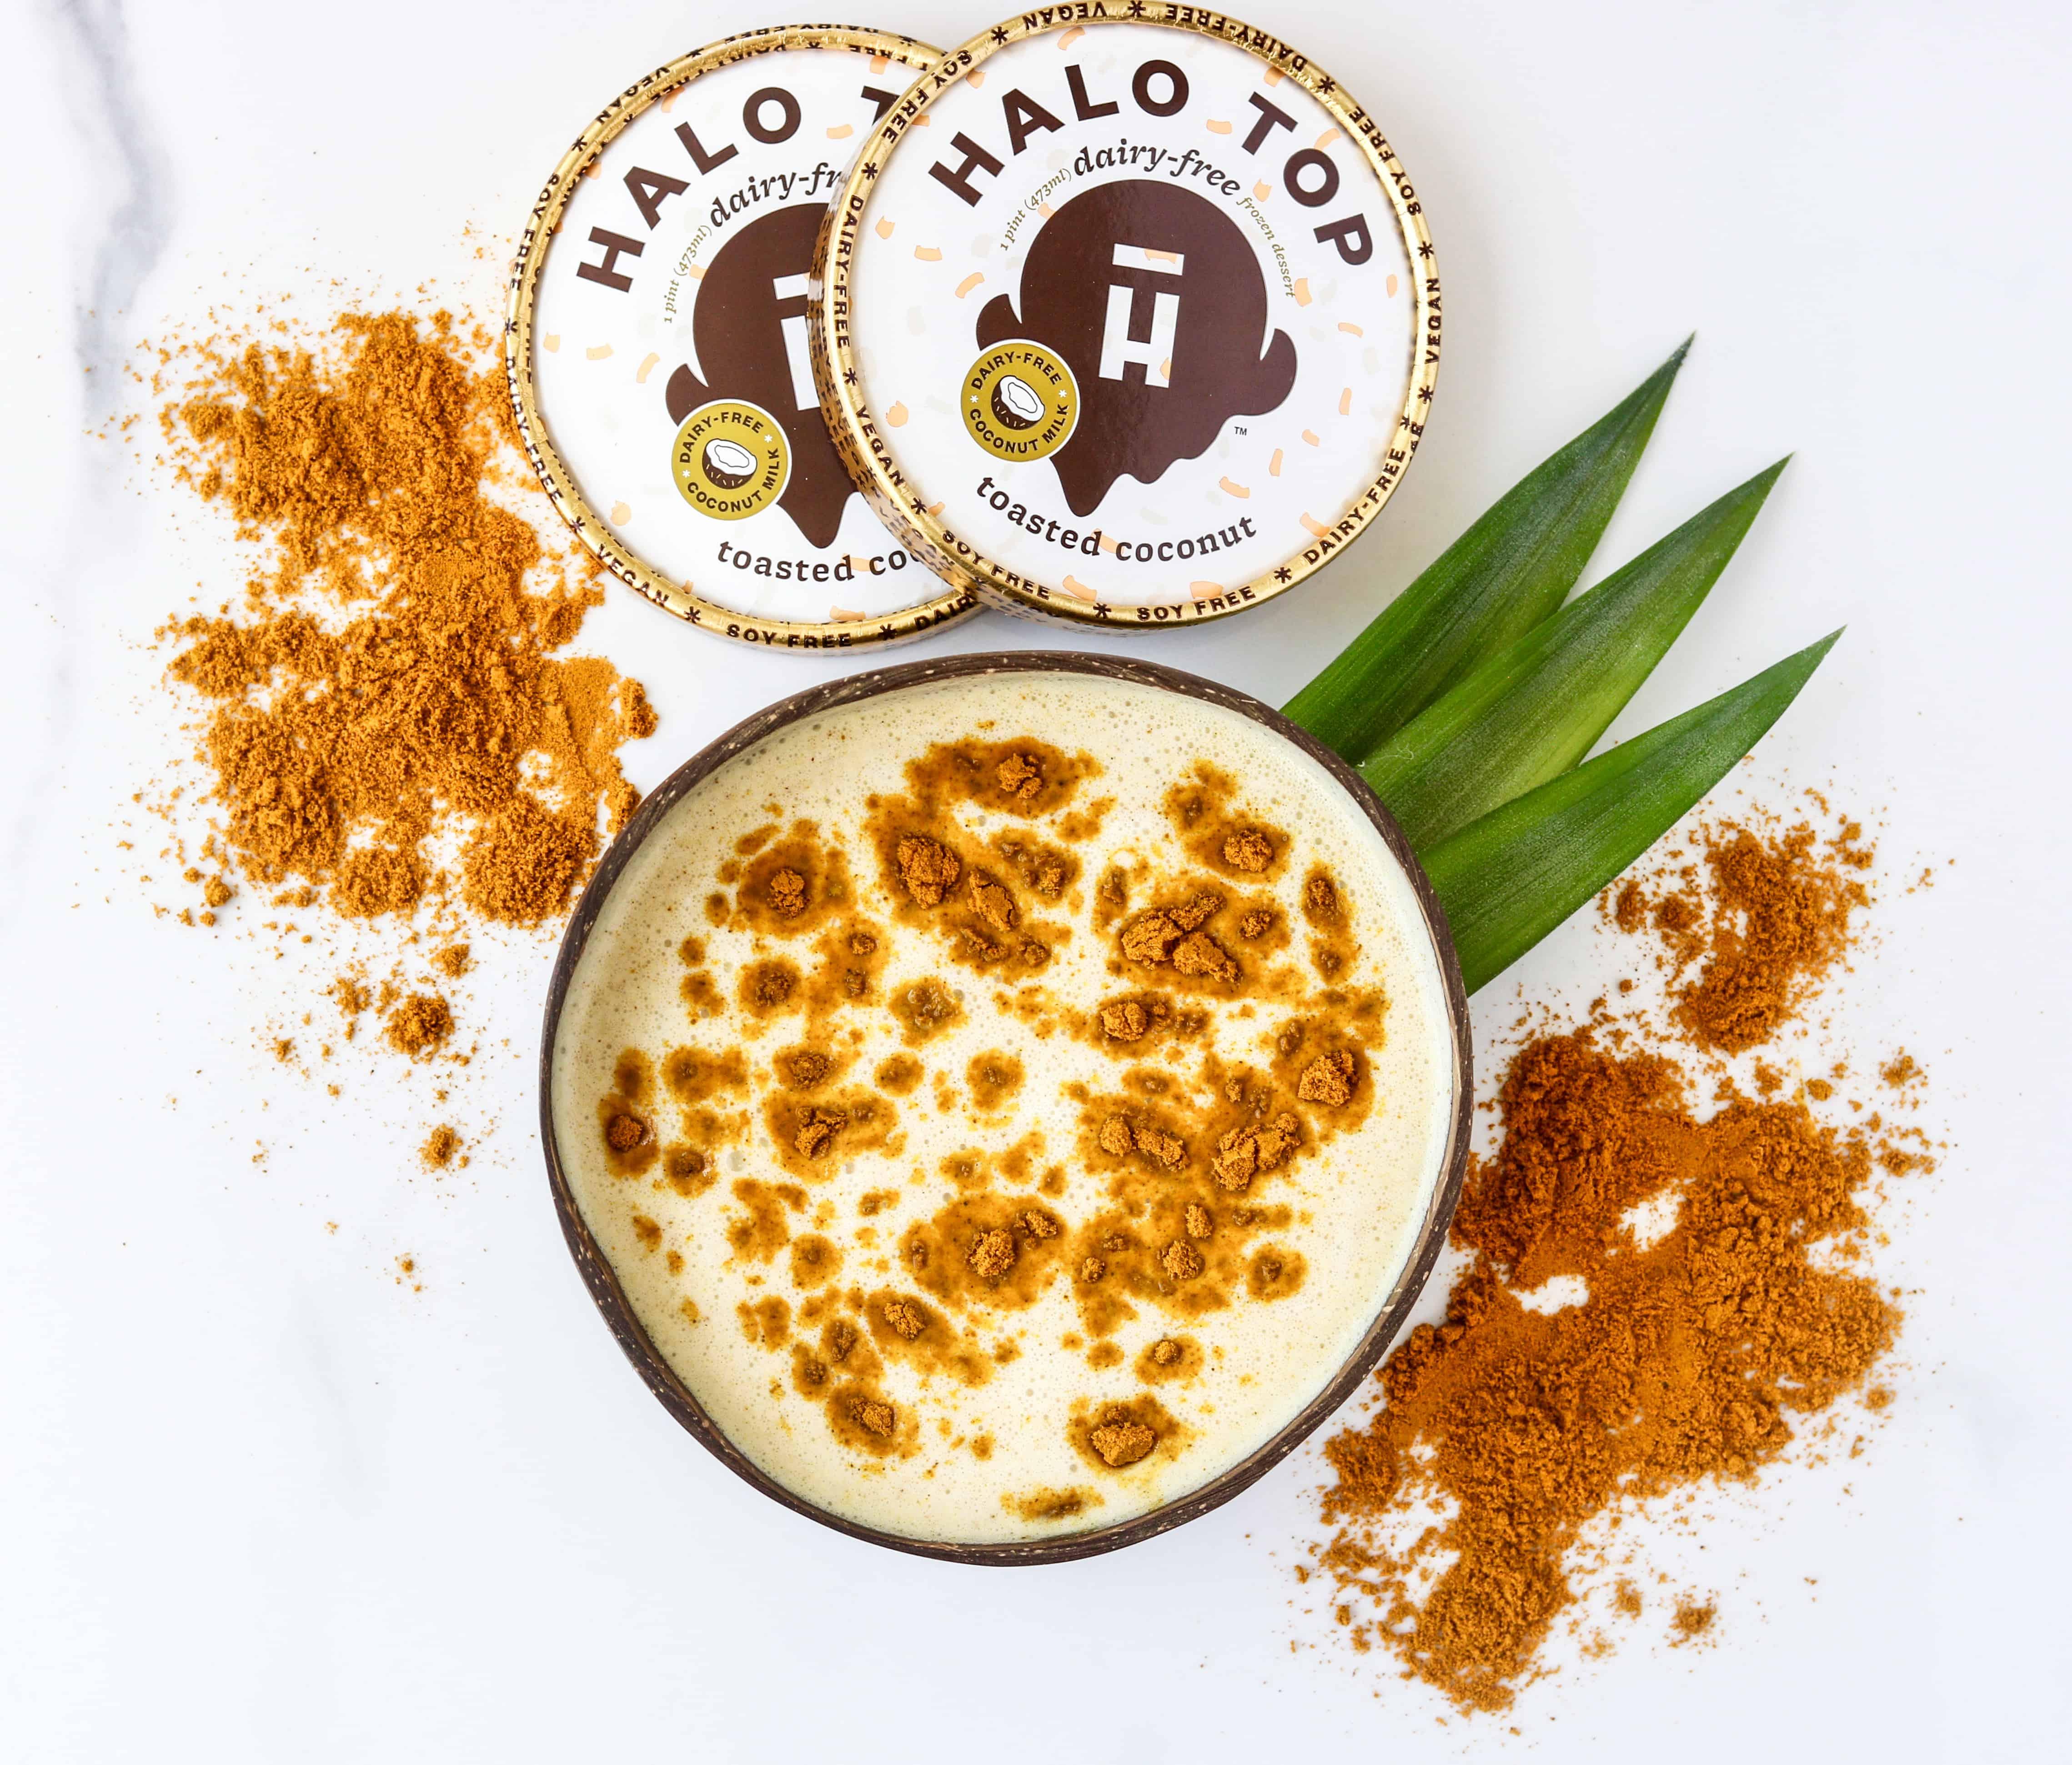 Golden Milk Turmeric Latte - Dairy Free, Vegan @shawsimpleswaps